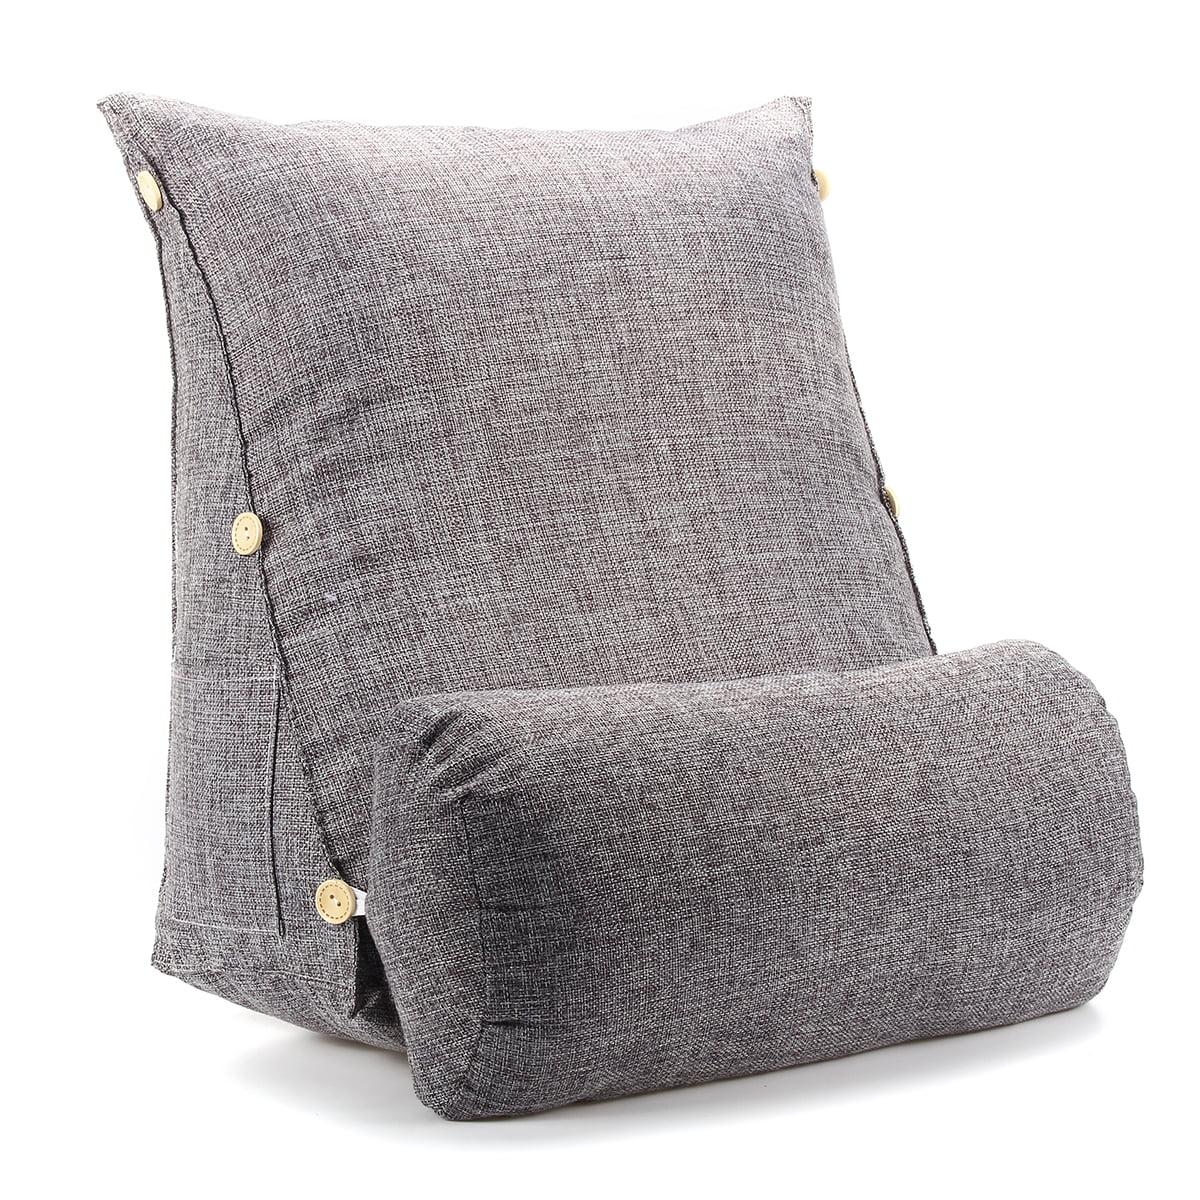 Adjustable Wedge Cotton Back Cushion Pillow Office Sofa Bed Backrest Waist Support Smoke Grey Size 18 X18 X8 Walmart Com Walmart Com